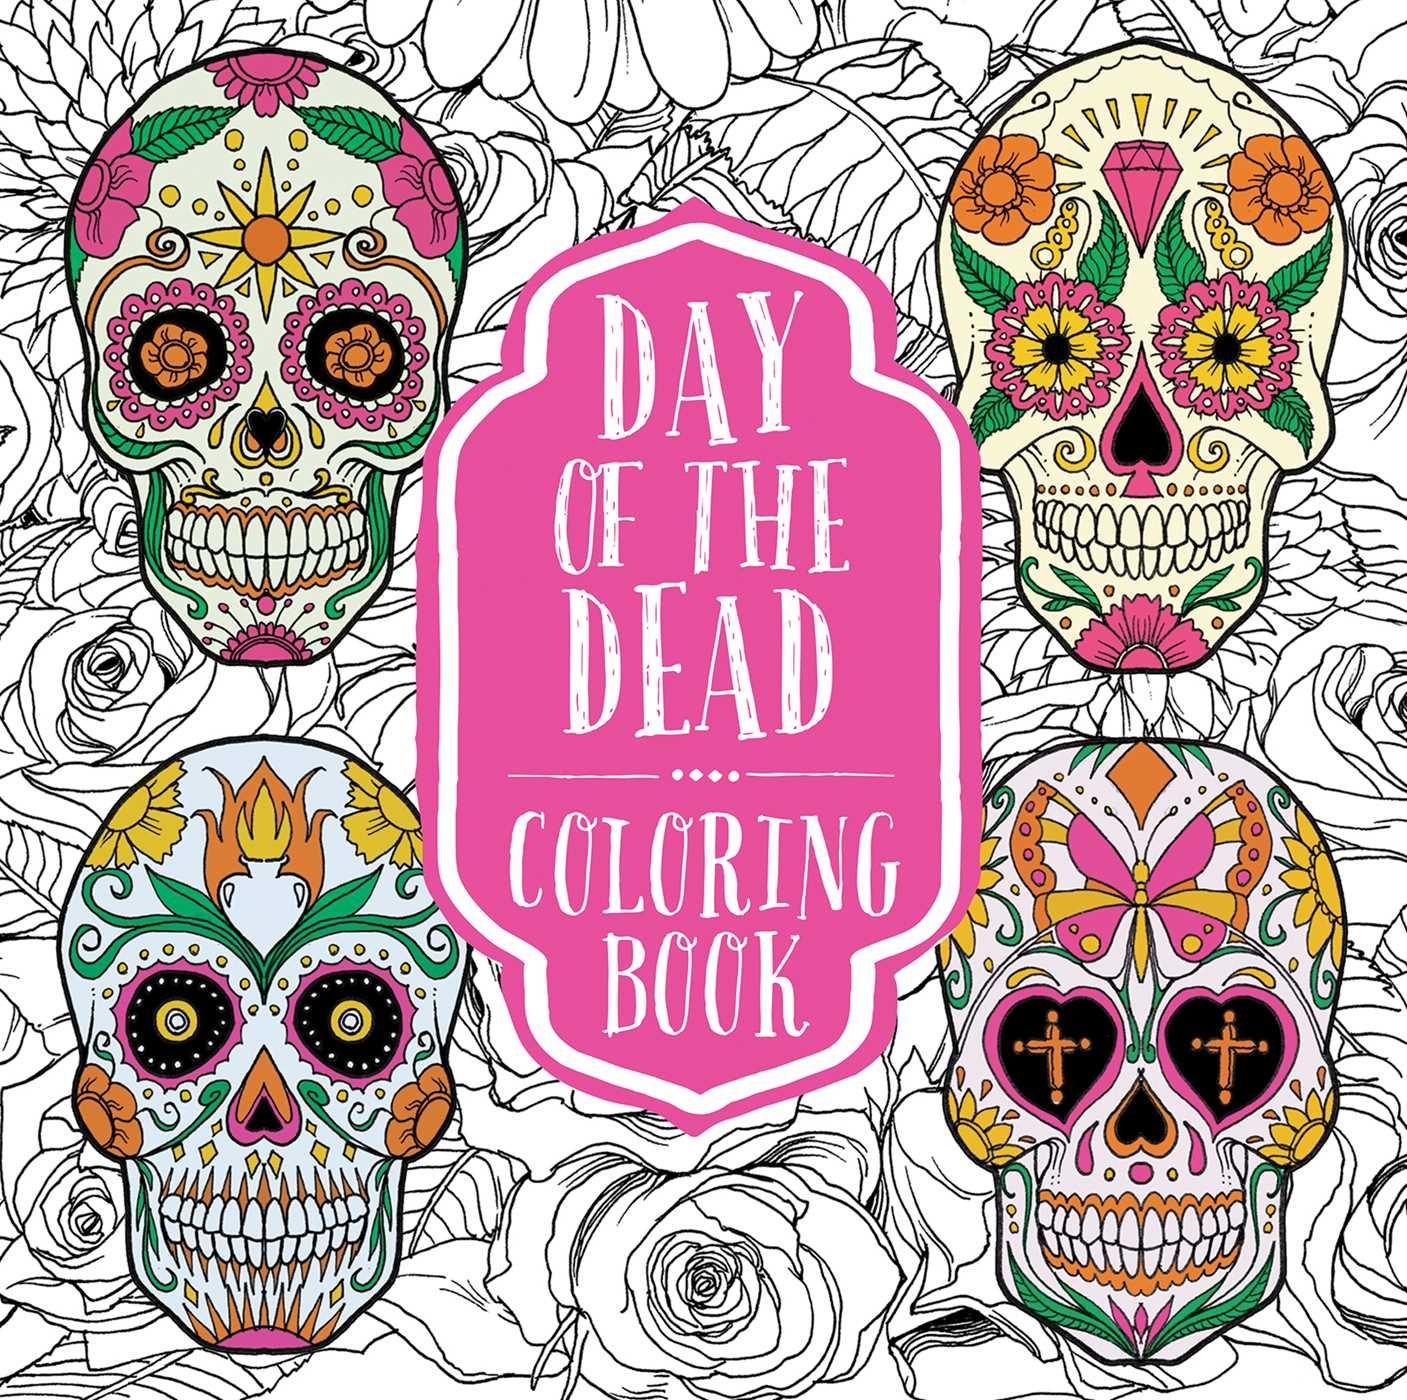 - Day Of The Dead Coloring: Mazzara, Mauro, Bianchi, Andrea